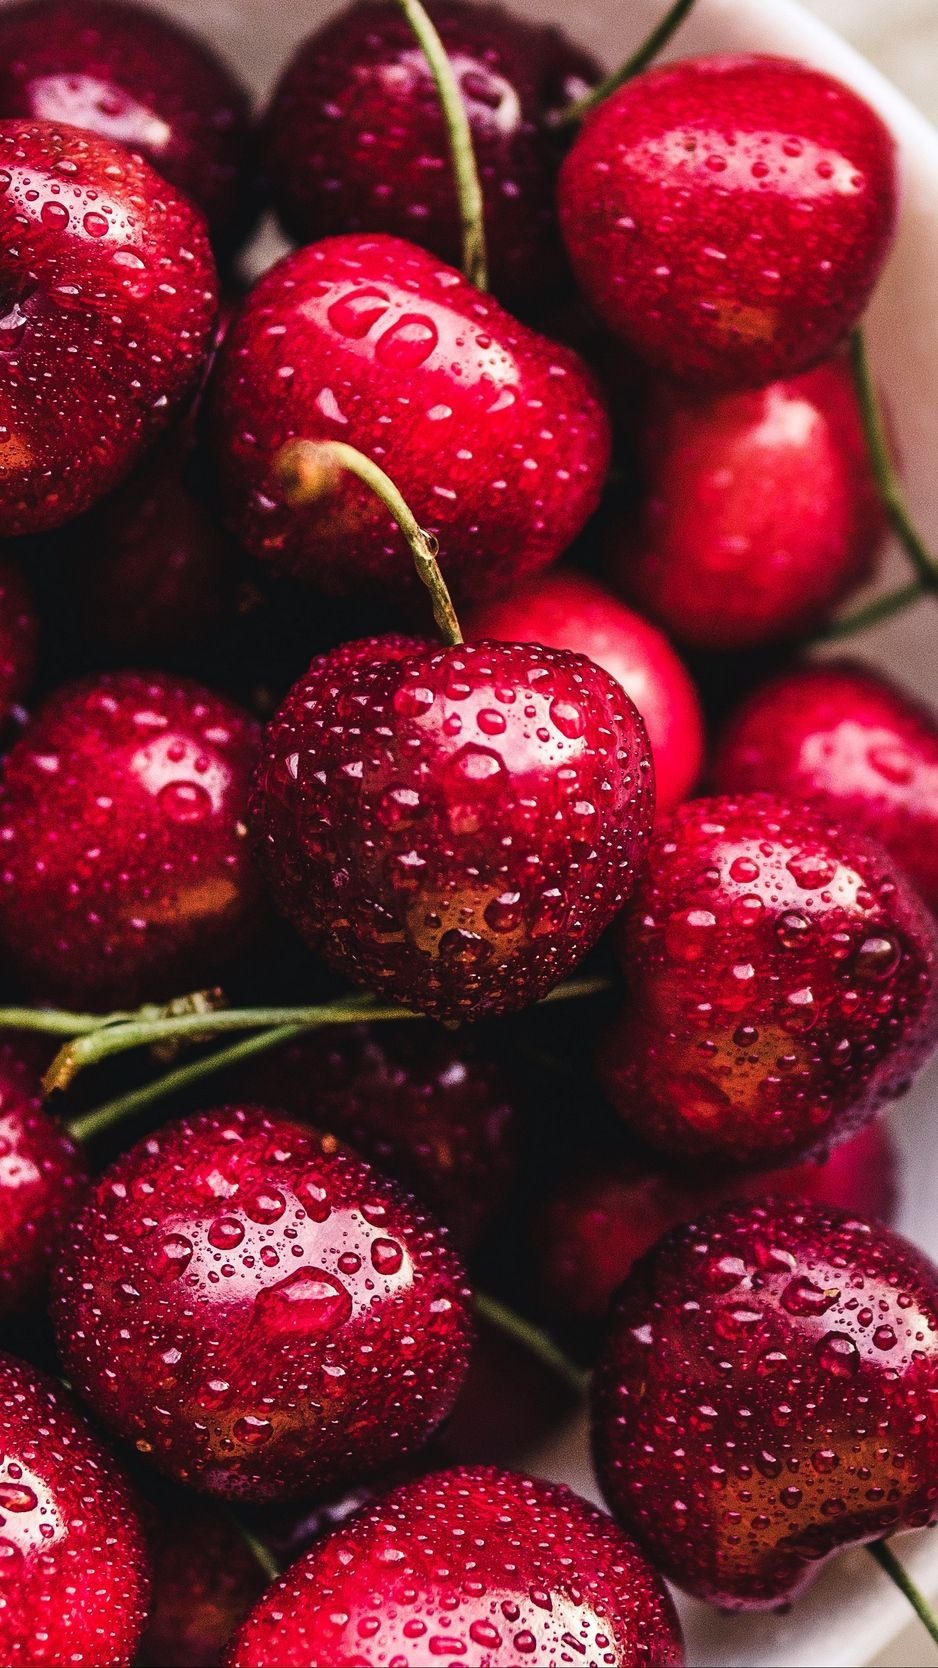 Cherries Cherry Berries Drops Ripe Wallpaper Background Fruit Wallpaper Fruit Photography Fruits Images Hd wallpaper red fruit cherries berries